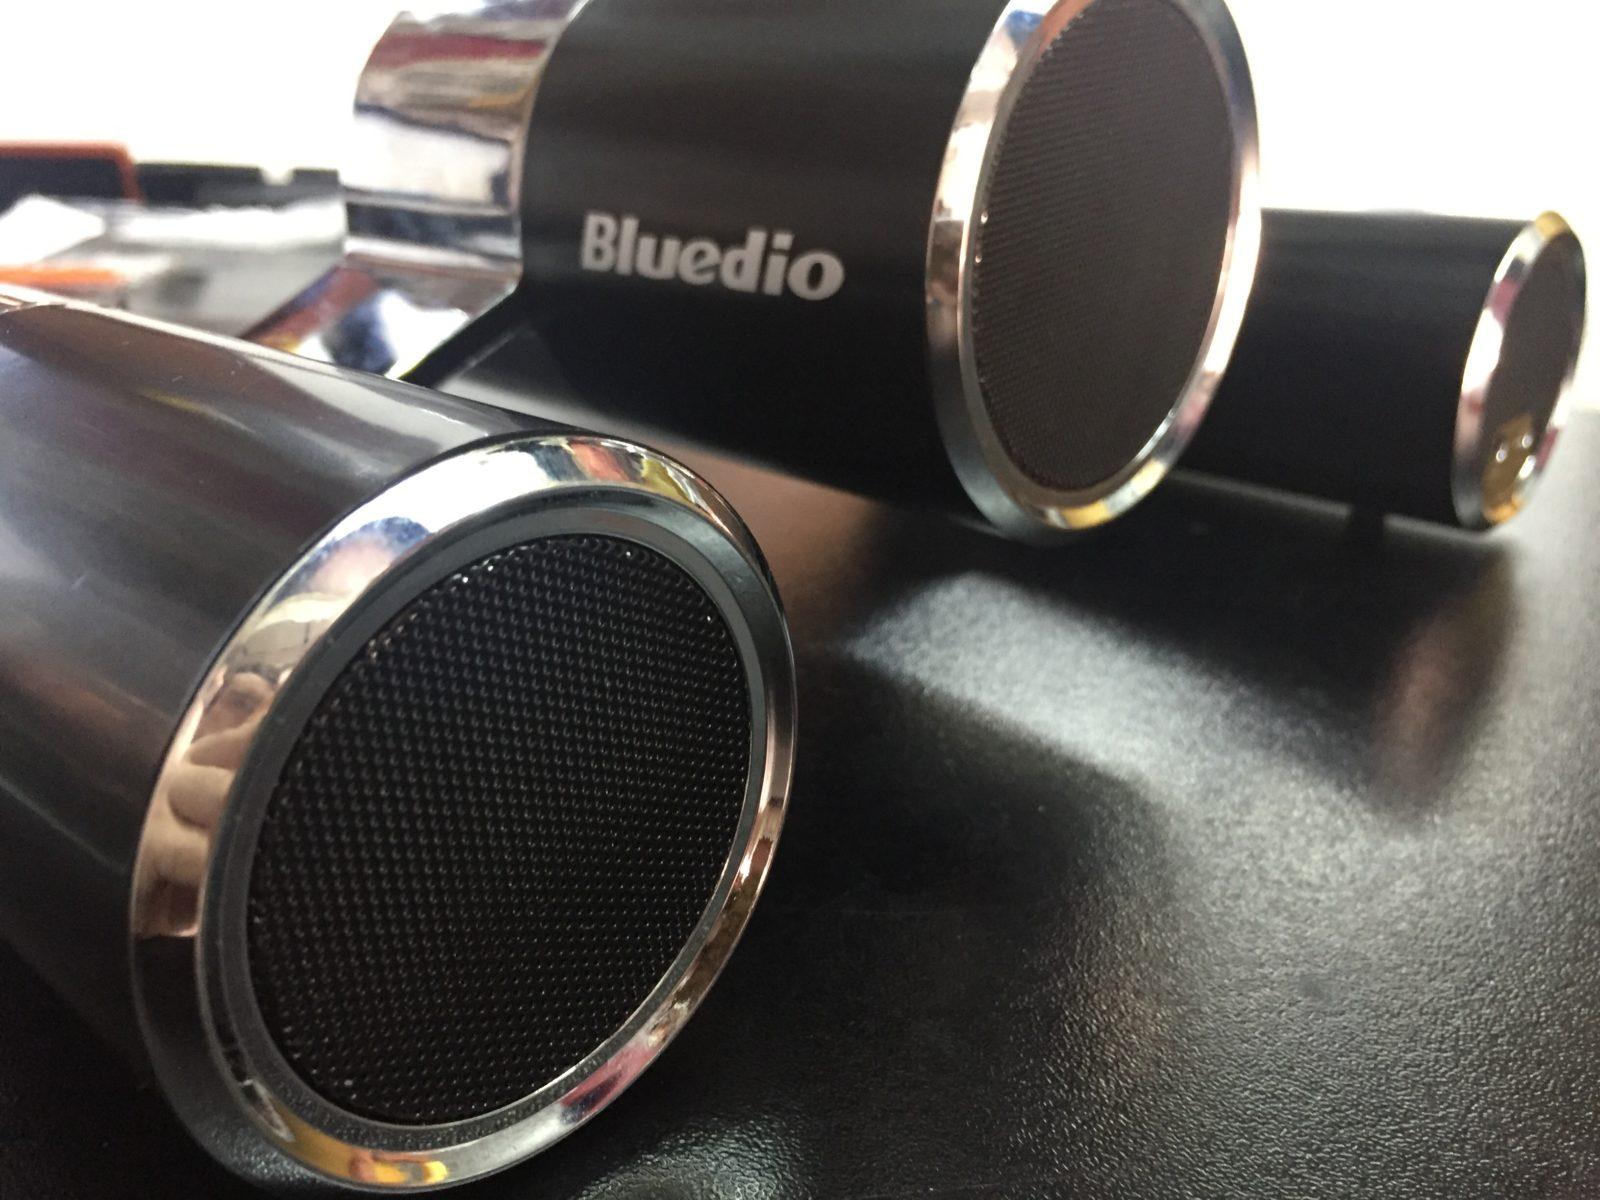 Ремонт колонки Bluedio. Замена разъема зарядки.